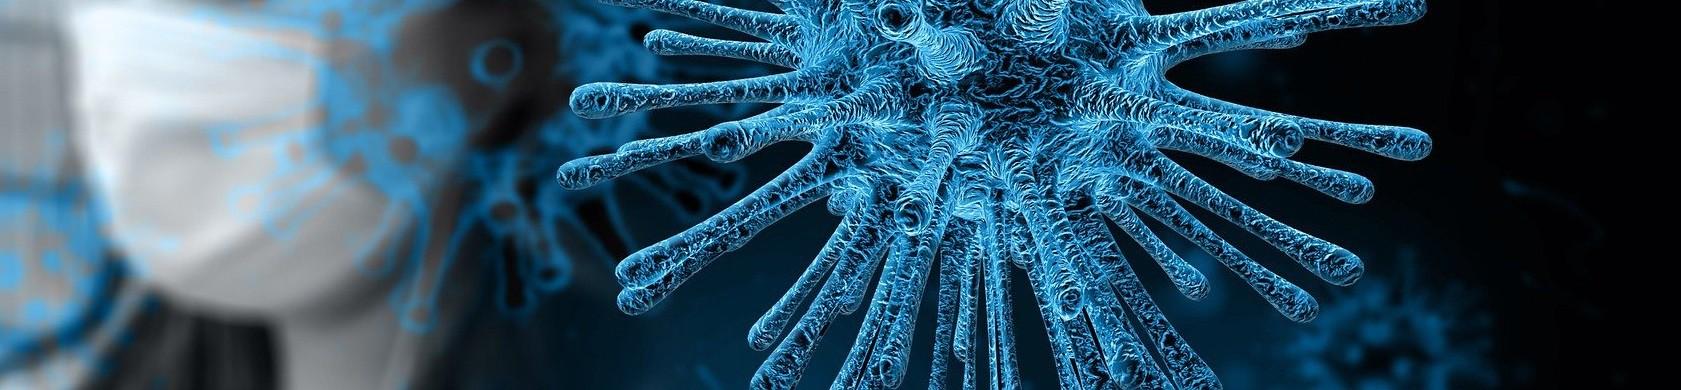 Koronawirus maseczki ochronne